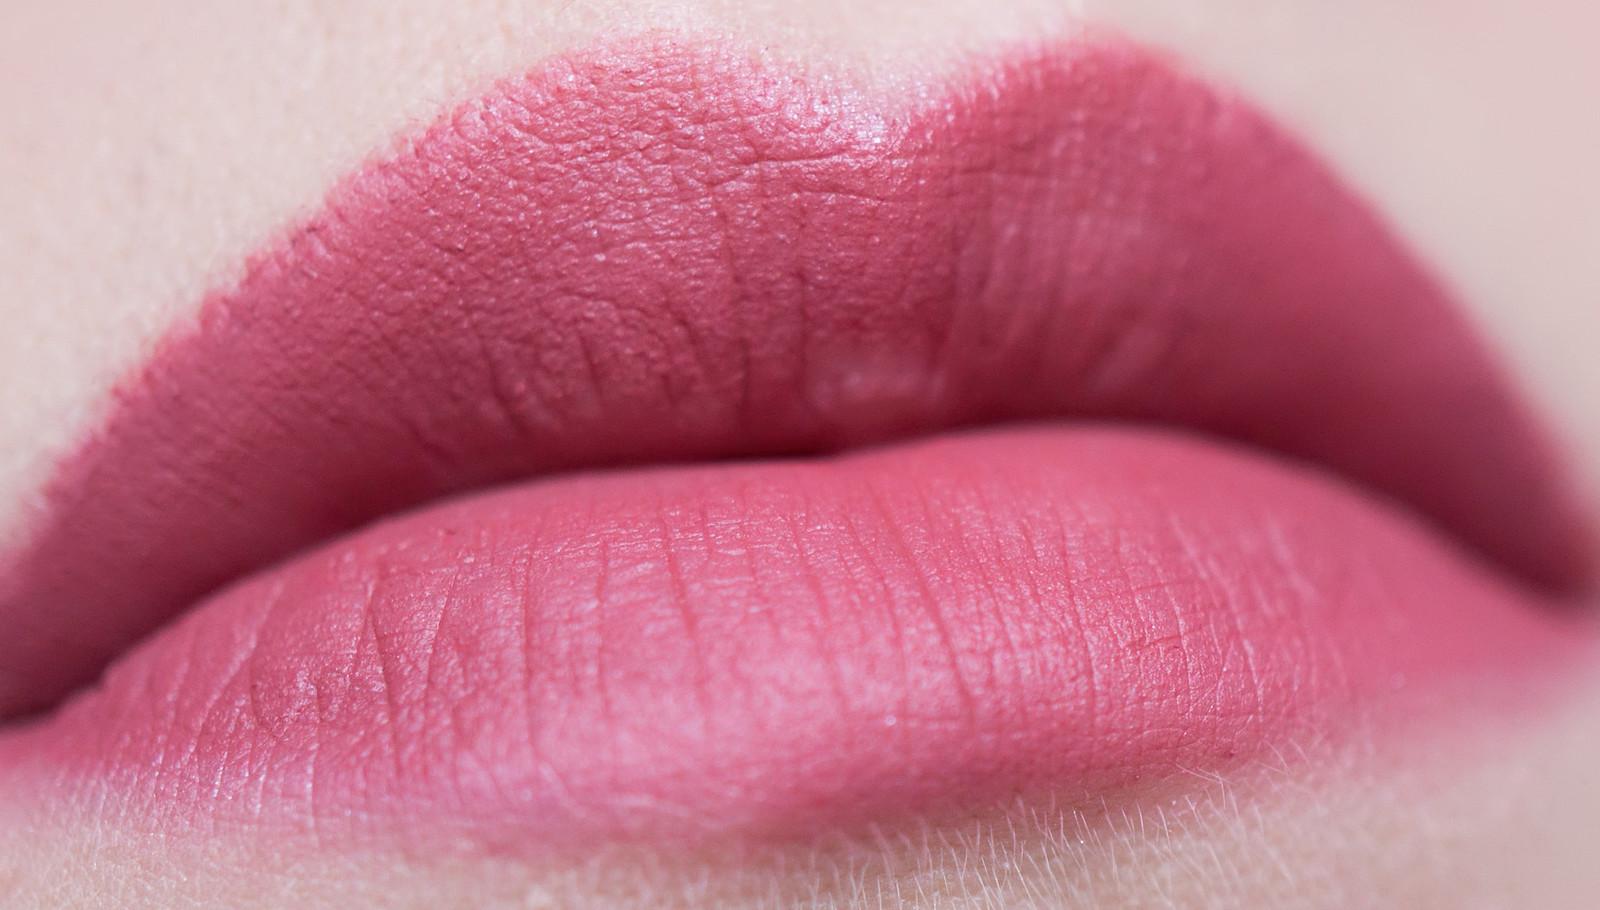 Burberry Liquid Lip Velvet 17 Dark Rosewood